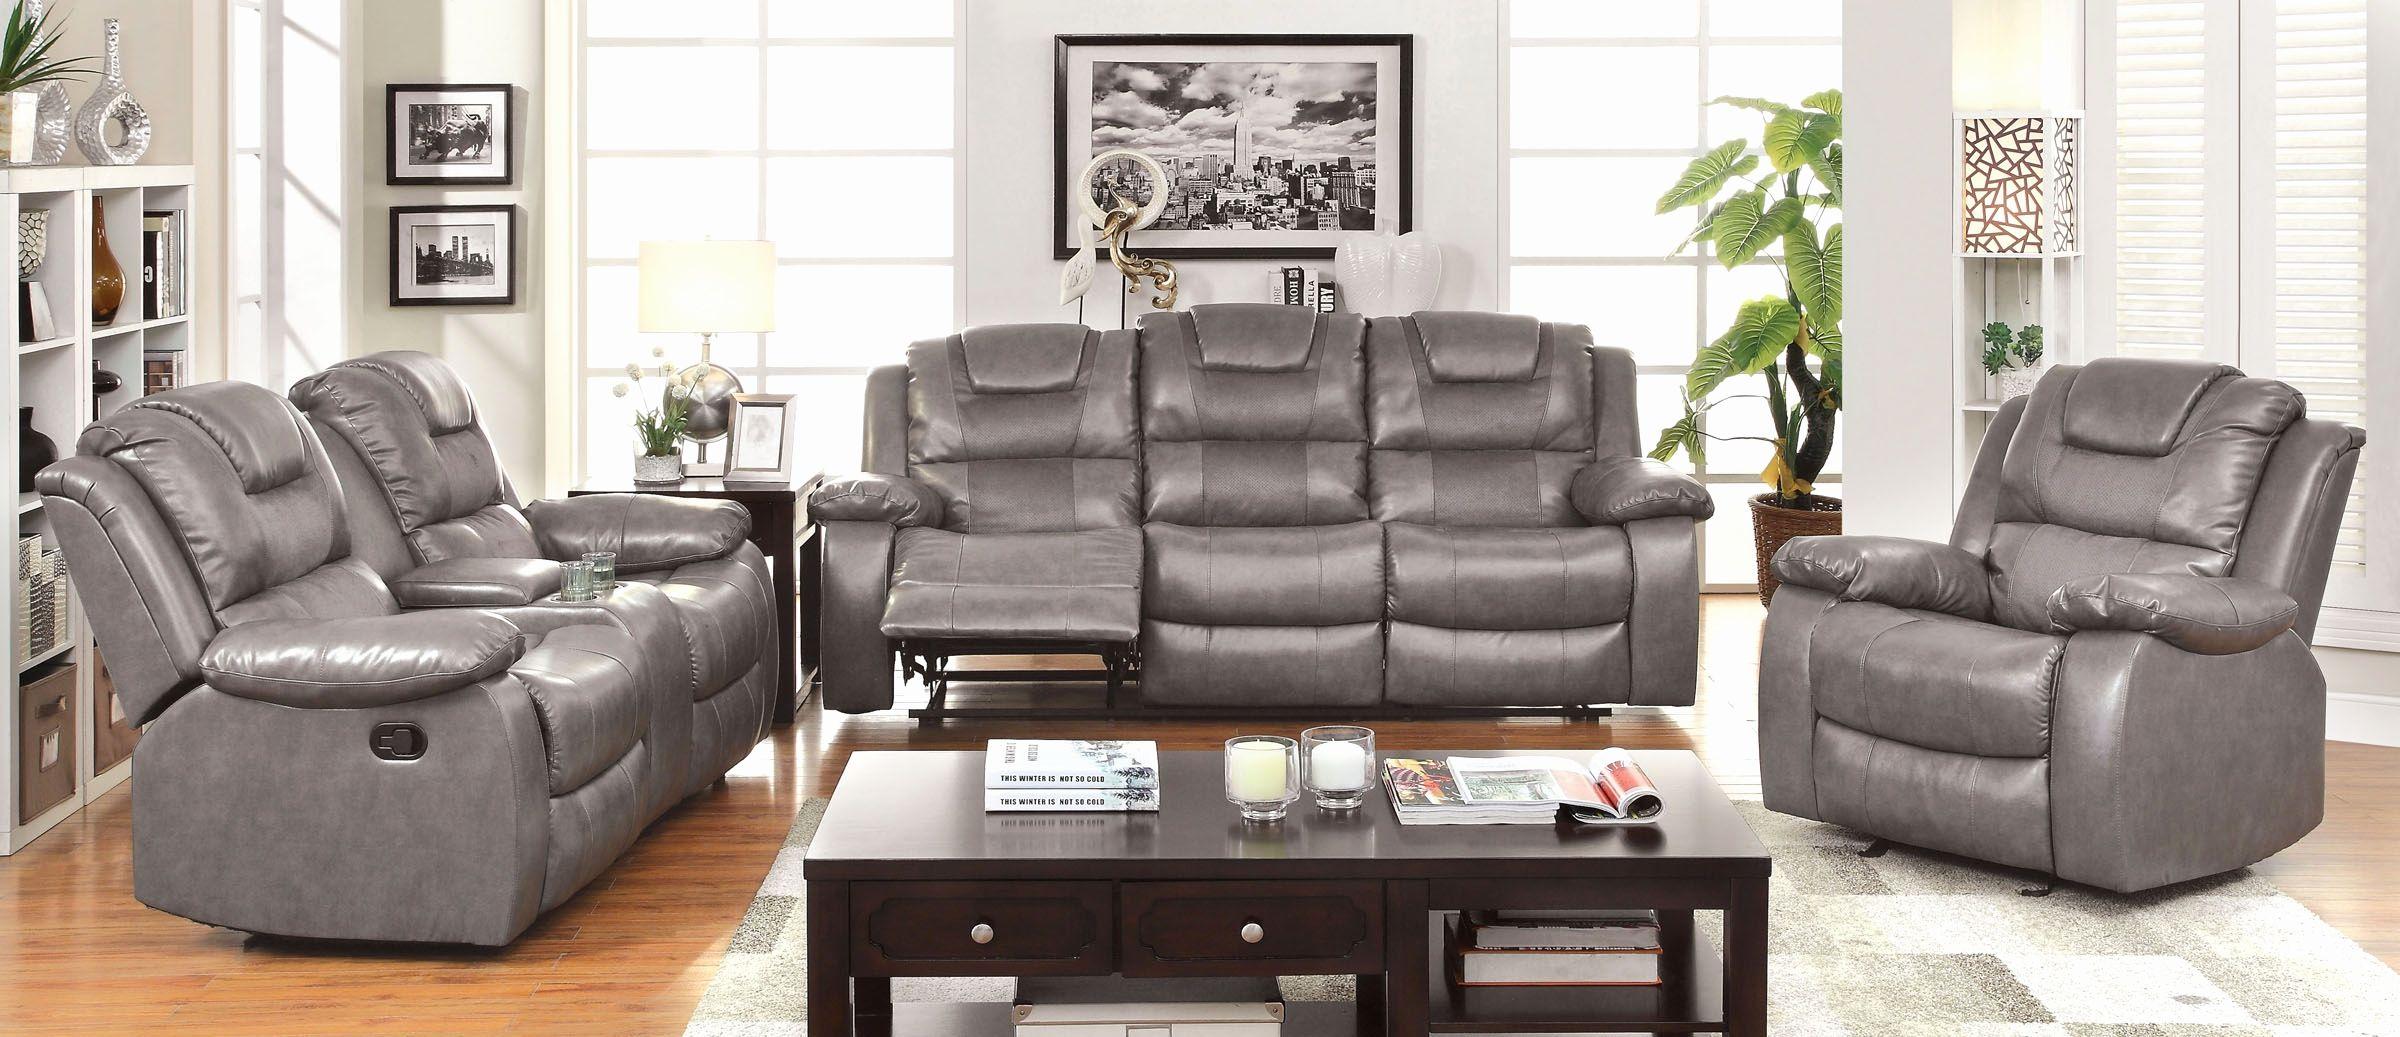 Strange New Microfiber Sofa And Loveseat Set Living Room Reclining Forskolin Free Trial Chair Design Images Forskolin Free Trialorg